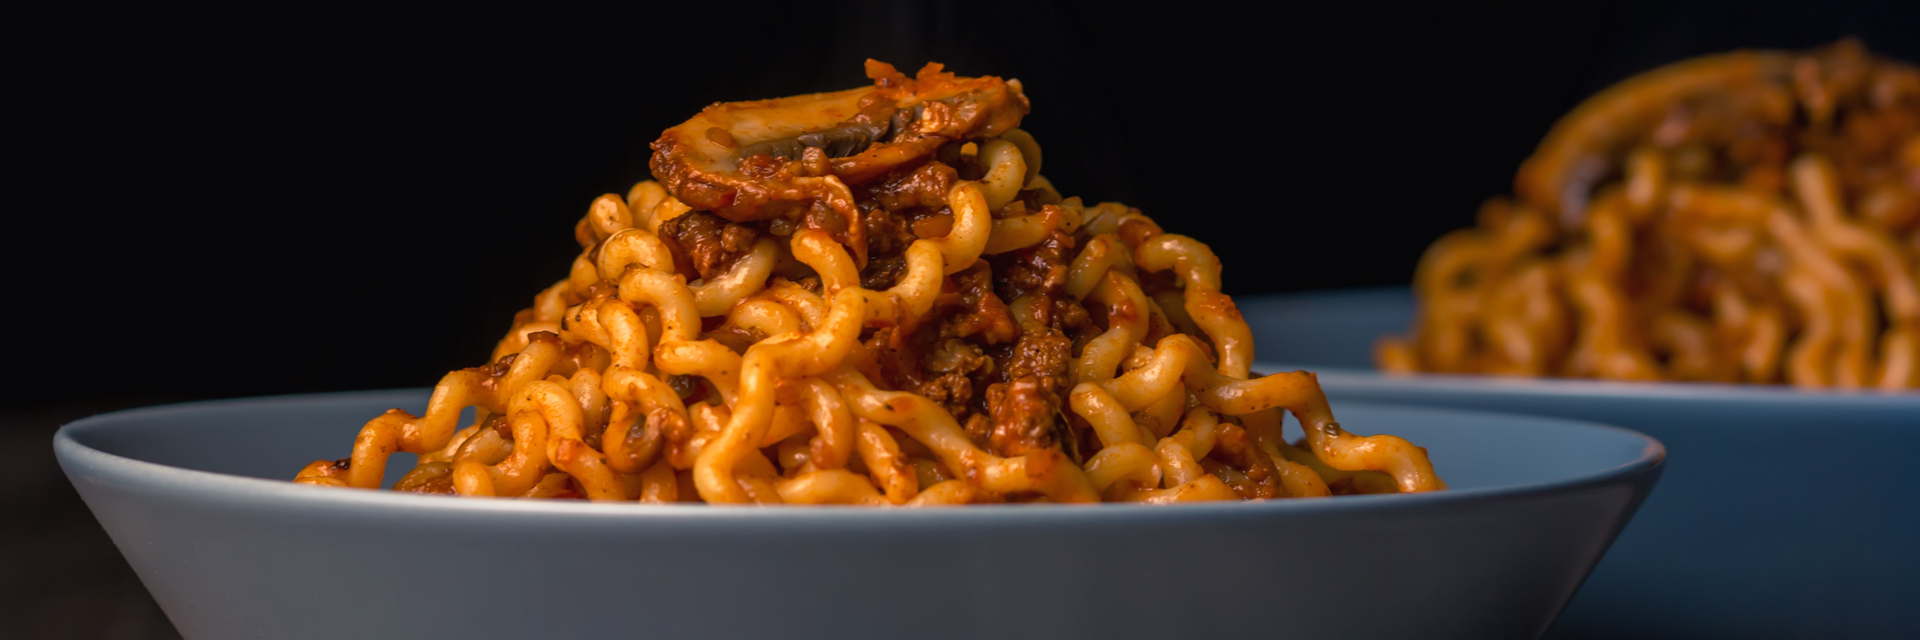 Bolognese Sauce Crock Pot Edition | Krumpli